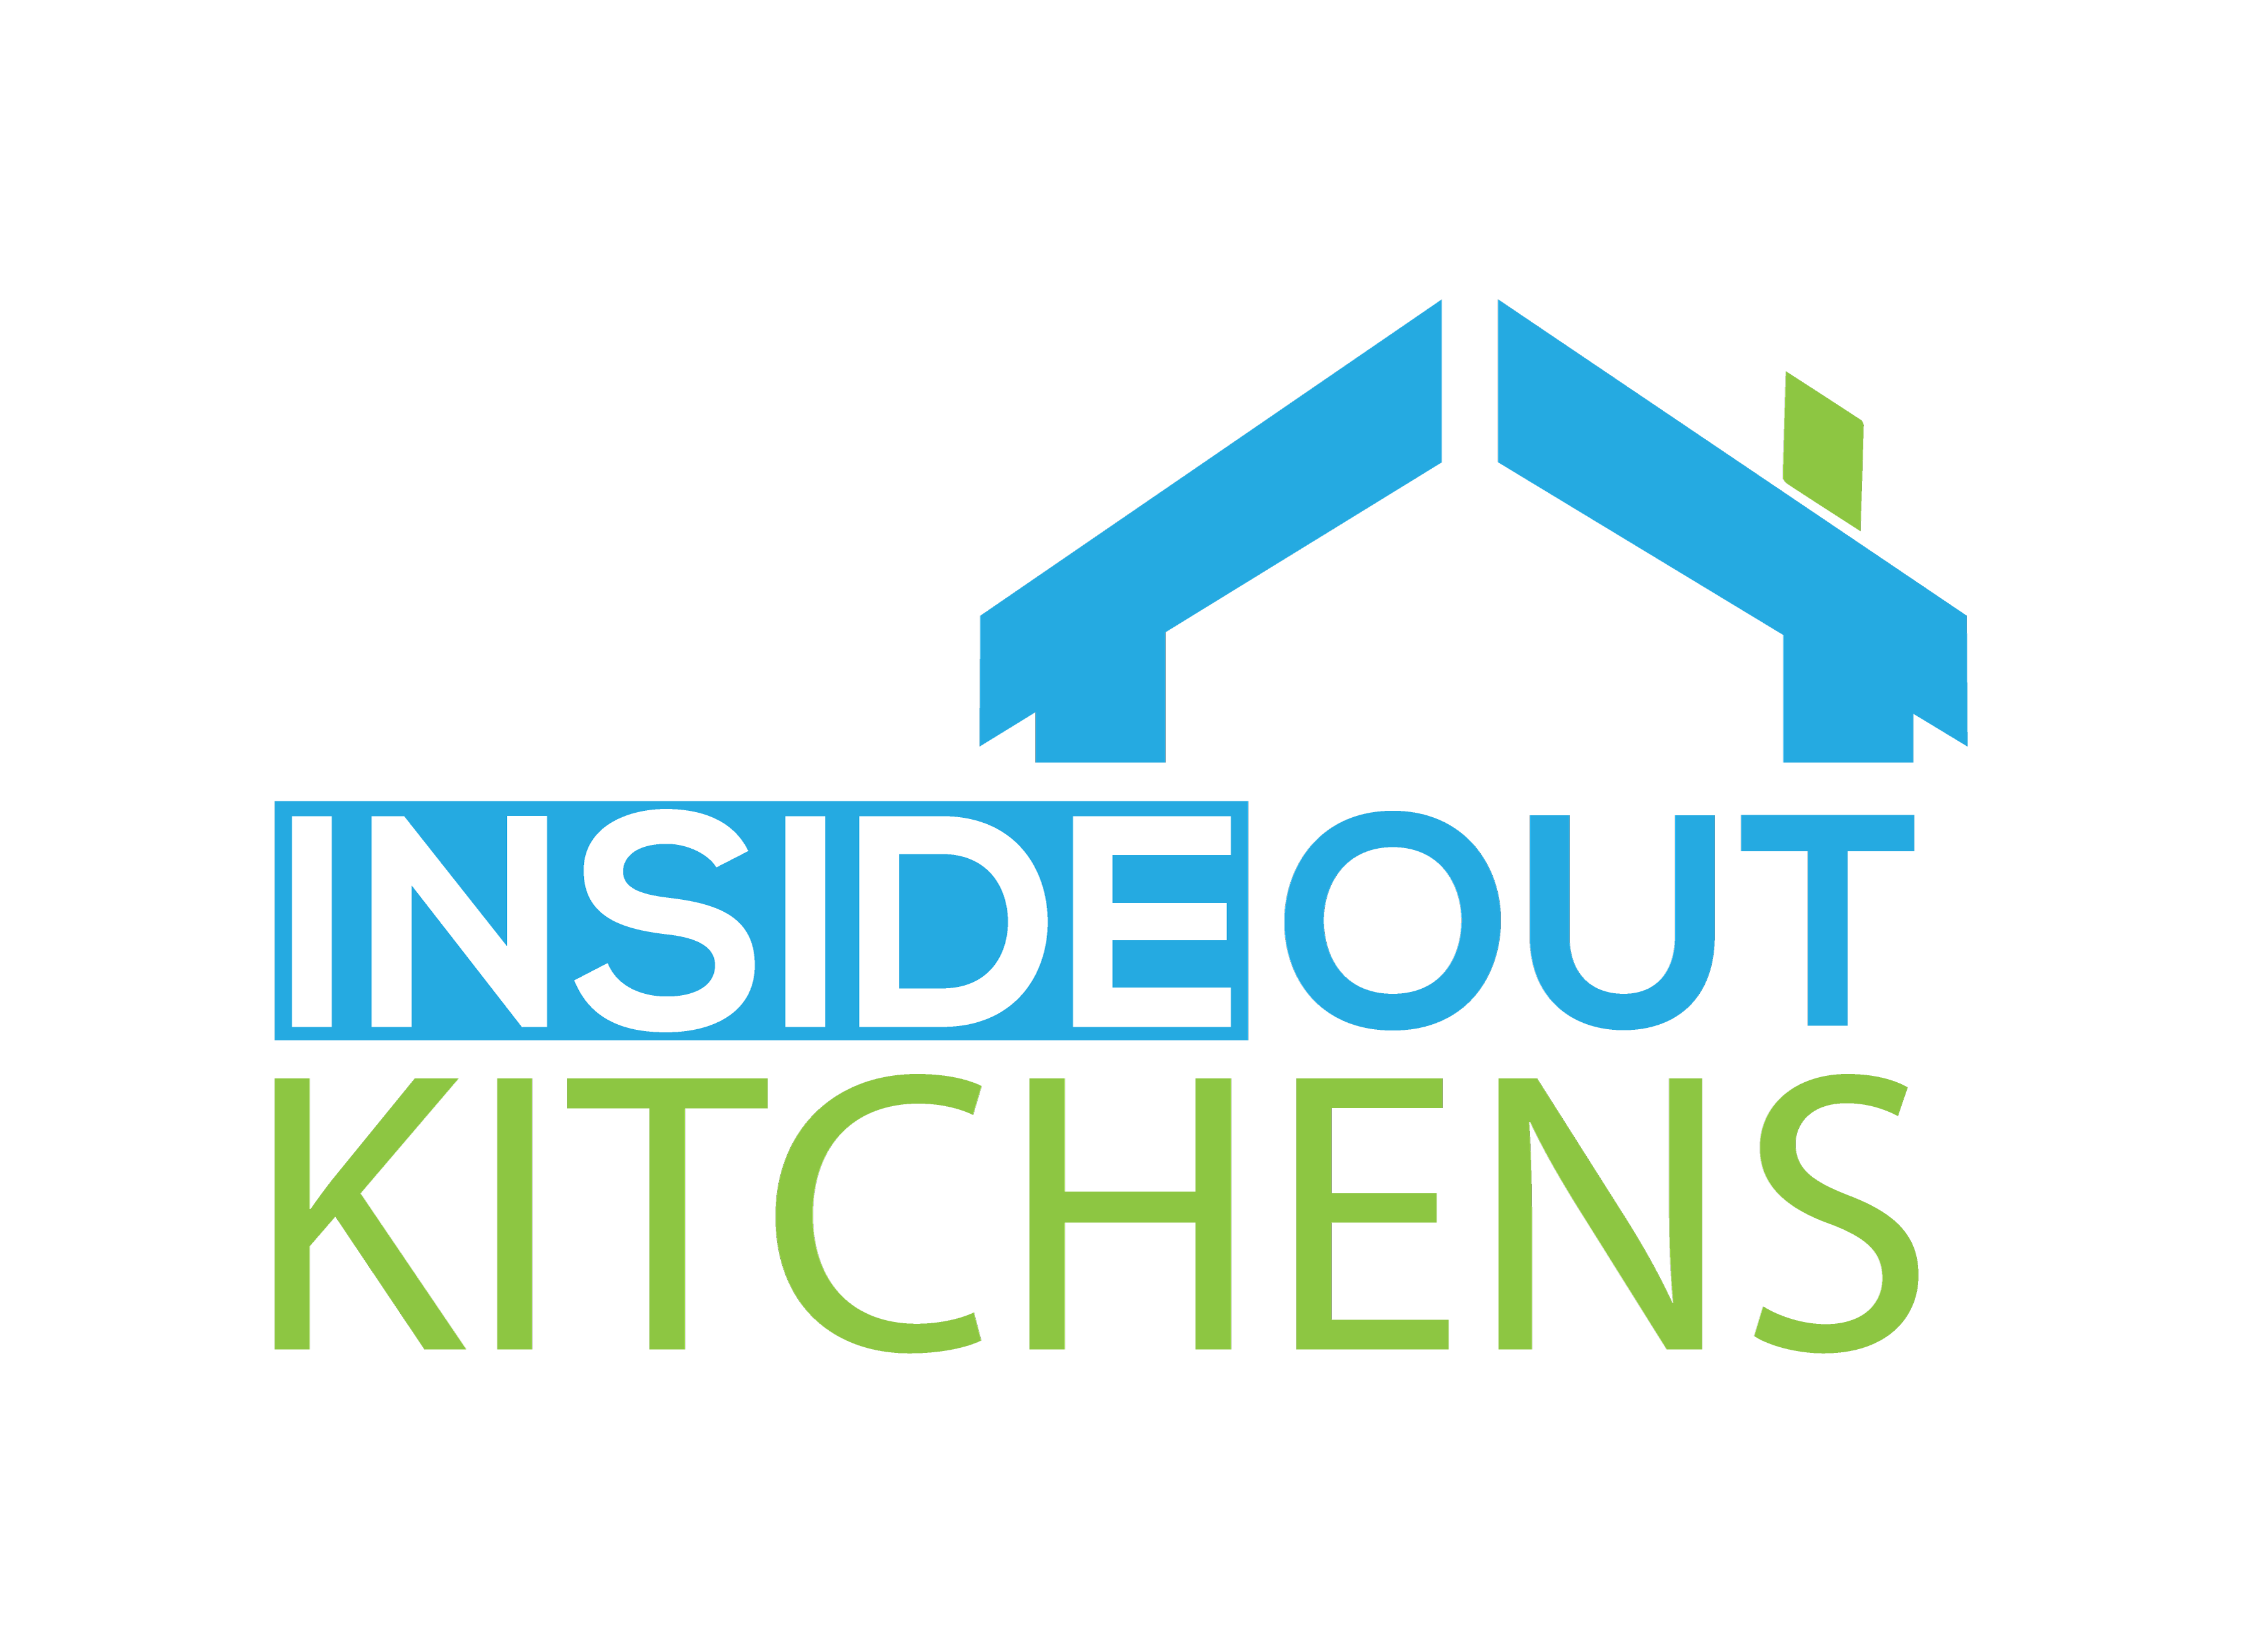 Genesis Kitchens